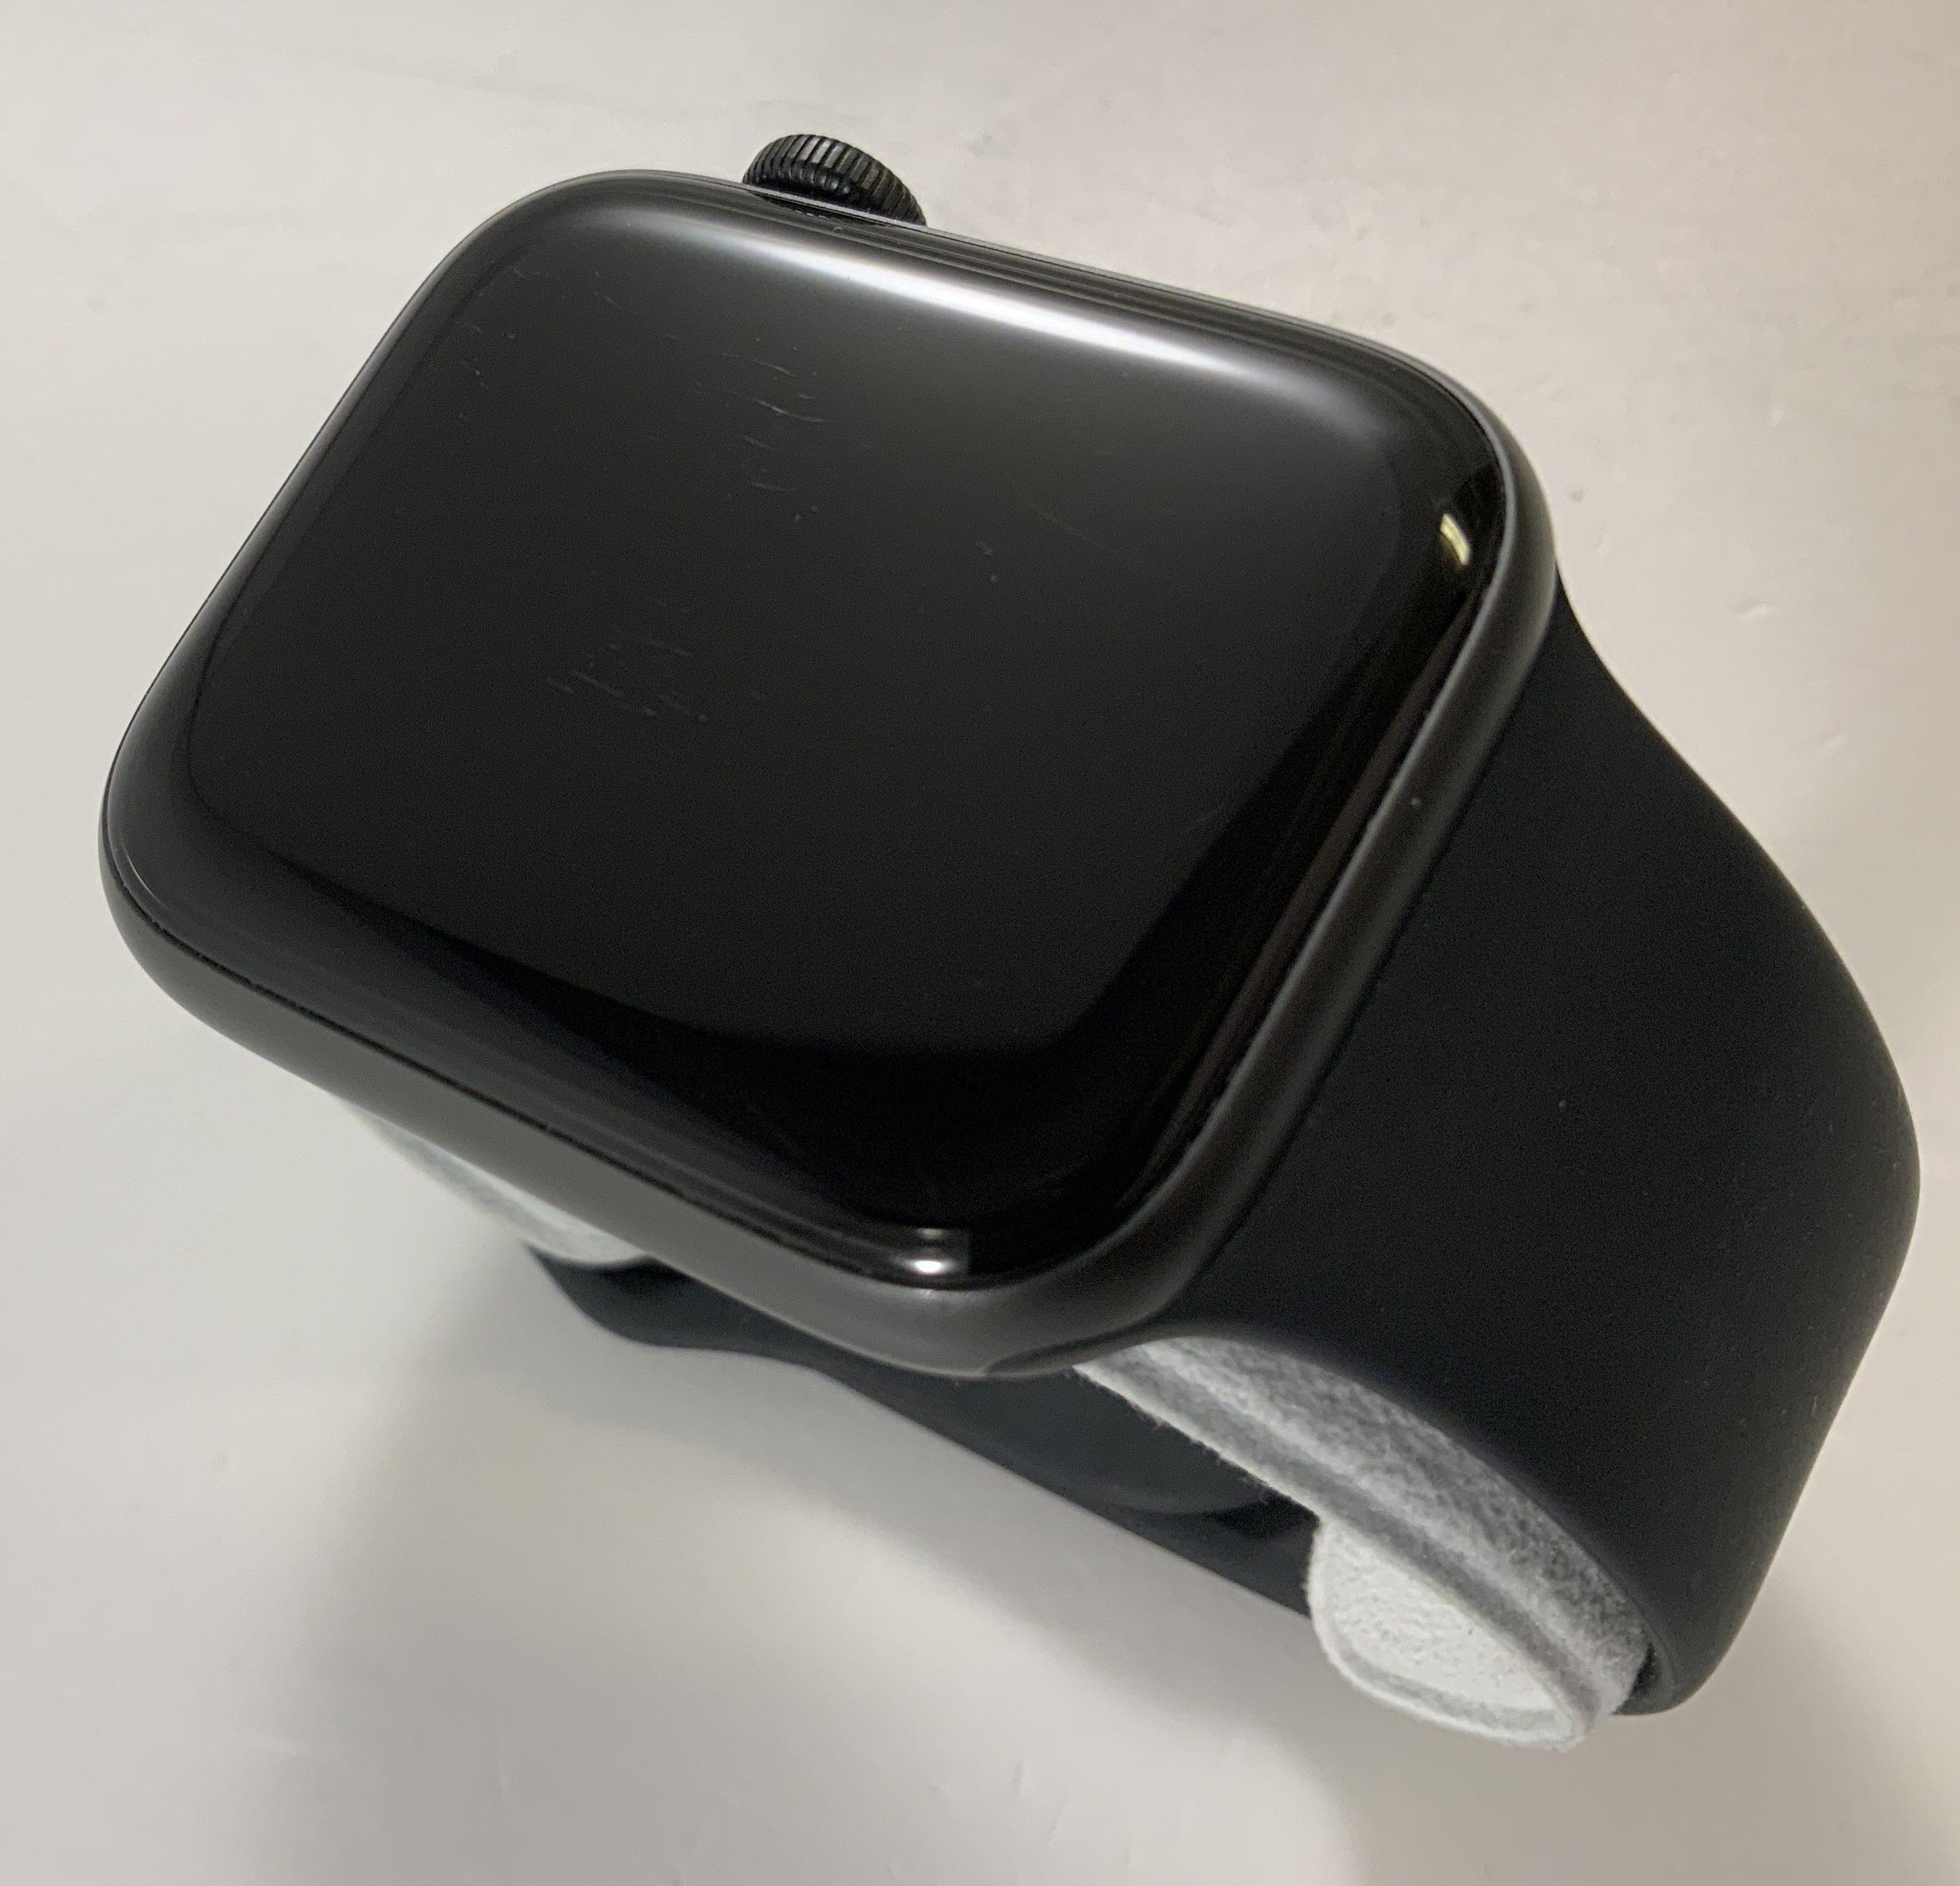 Watch Series 5 Aluminum Cellular (44mm), Space Gray, Kuva 3